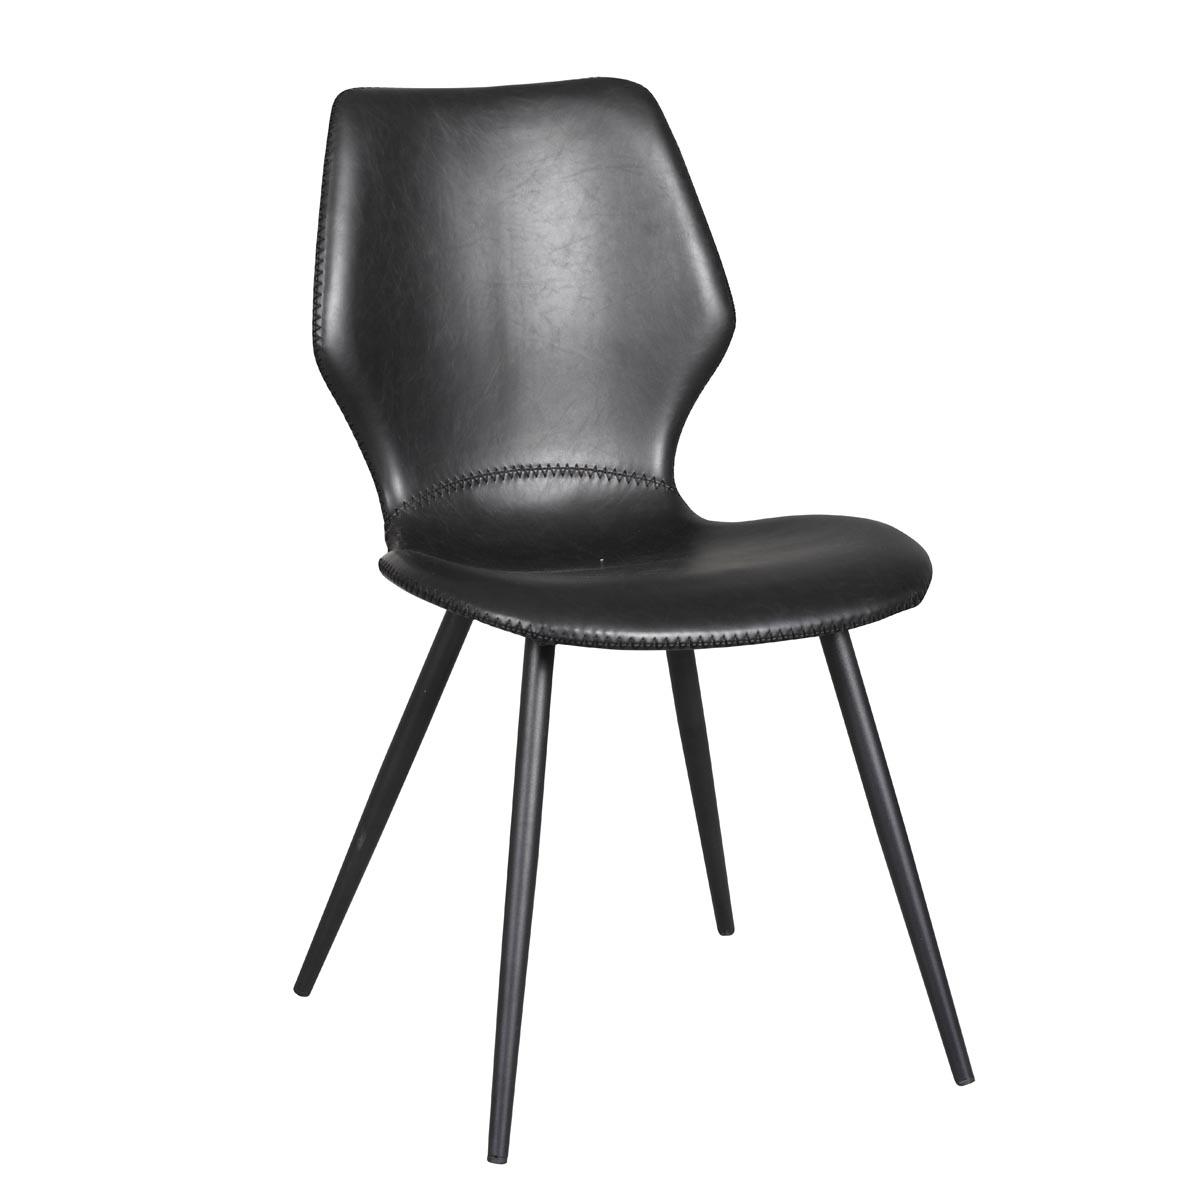 Highrock-stol-svart-118611